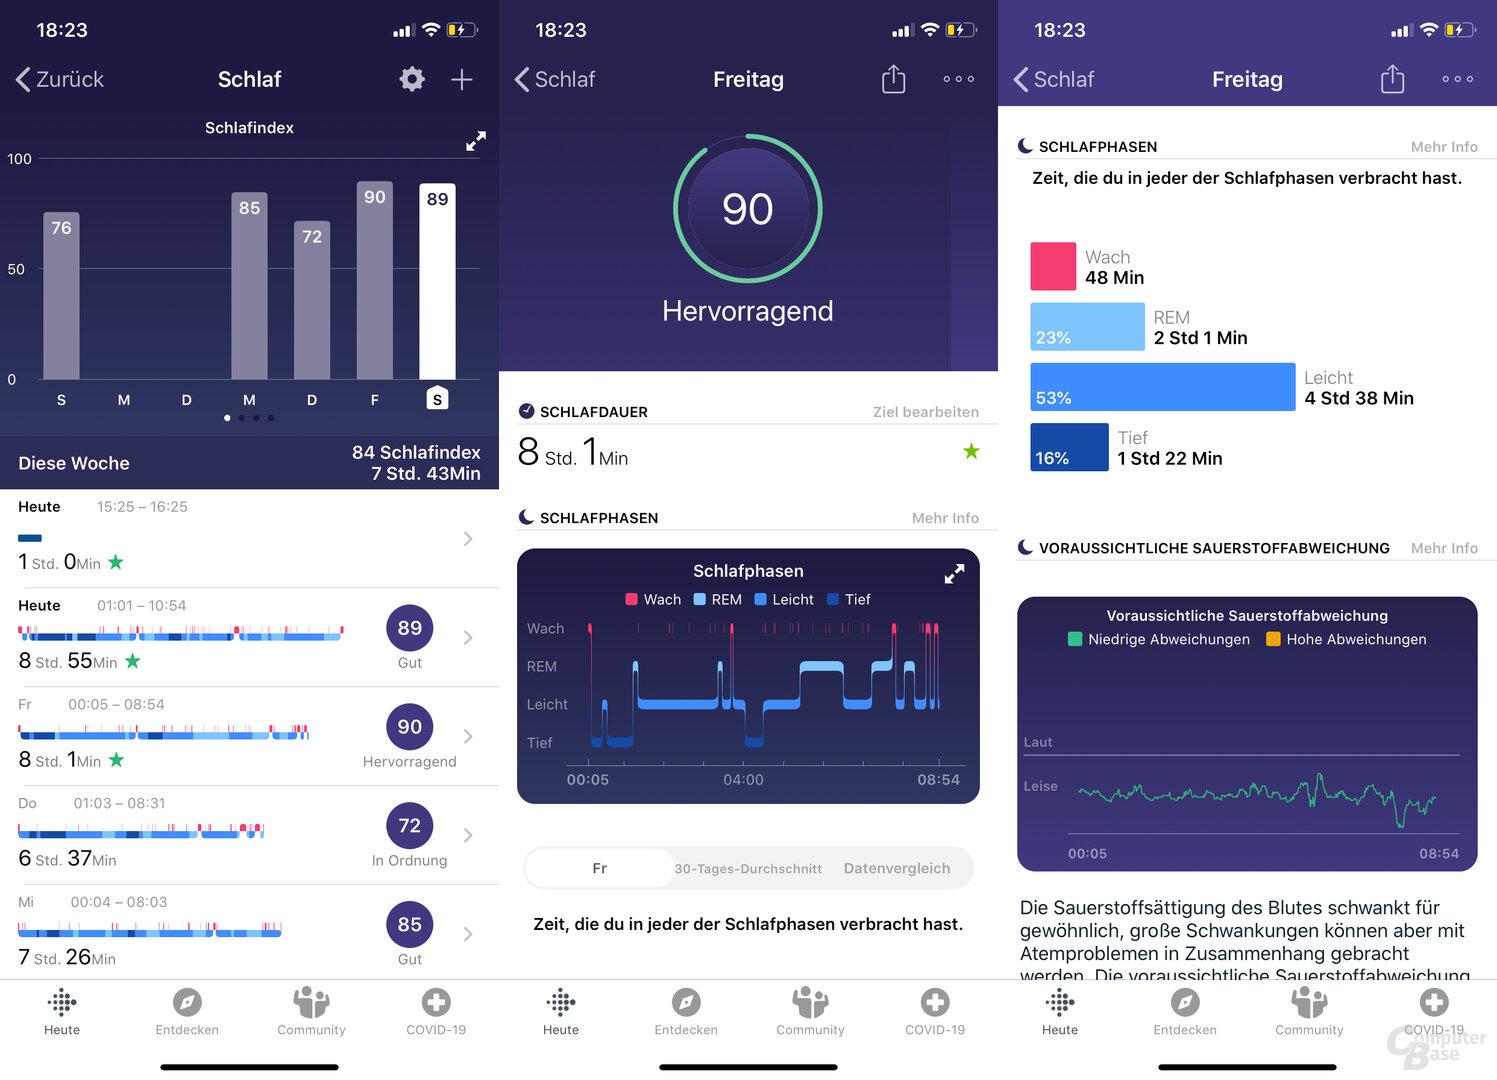 Fitbit Charge 4 im Test: Schlaf-Tracking und SpO2-Messung